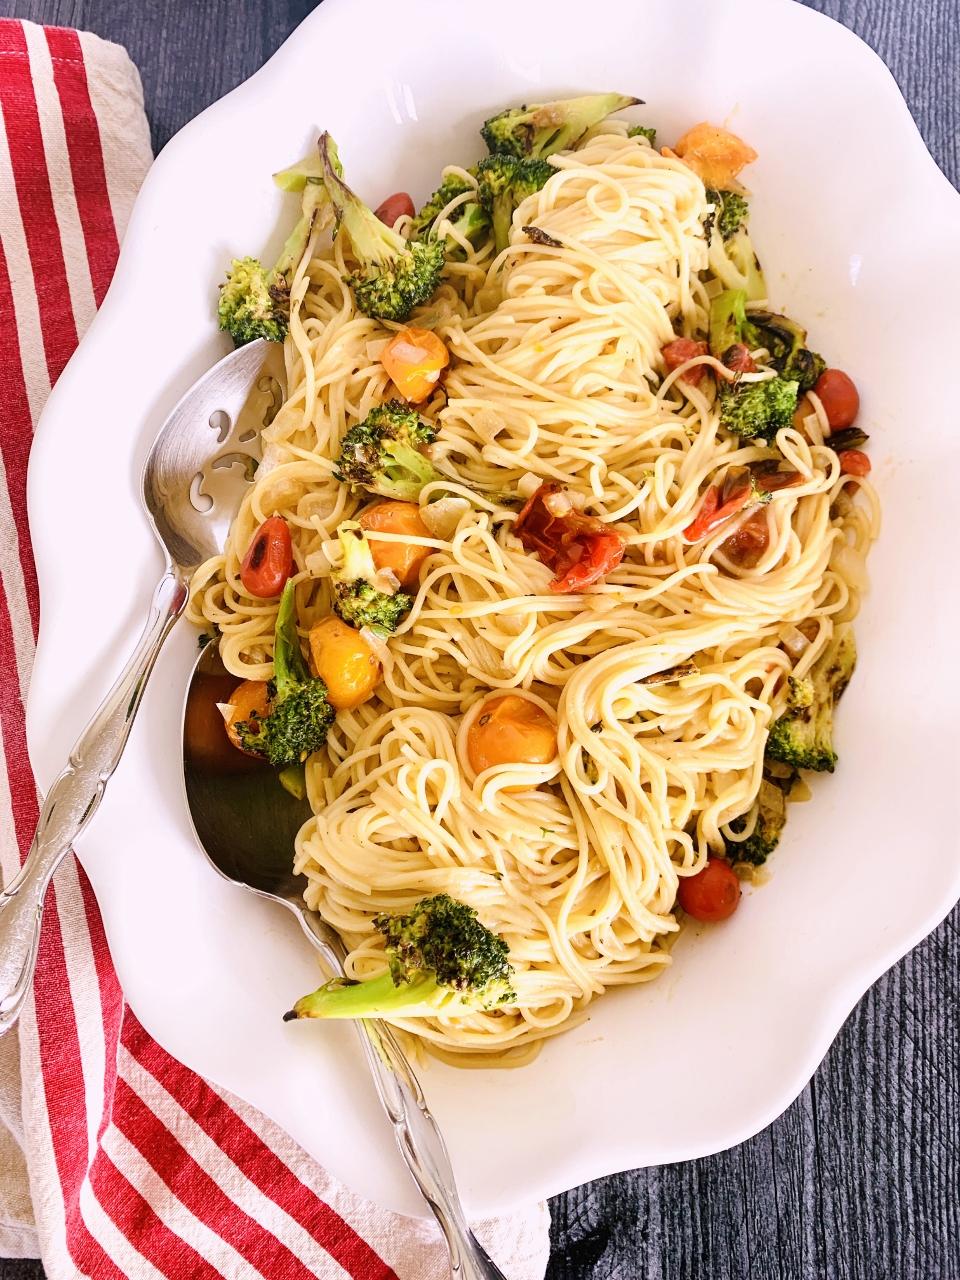 Creamy Vegan Spaghetti with Broccoli & Cherry Tomatoes – Recipe! Image 1